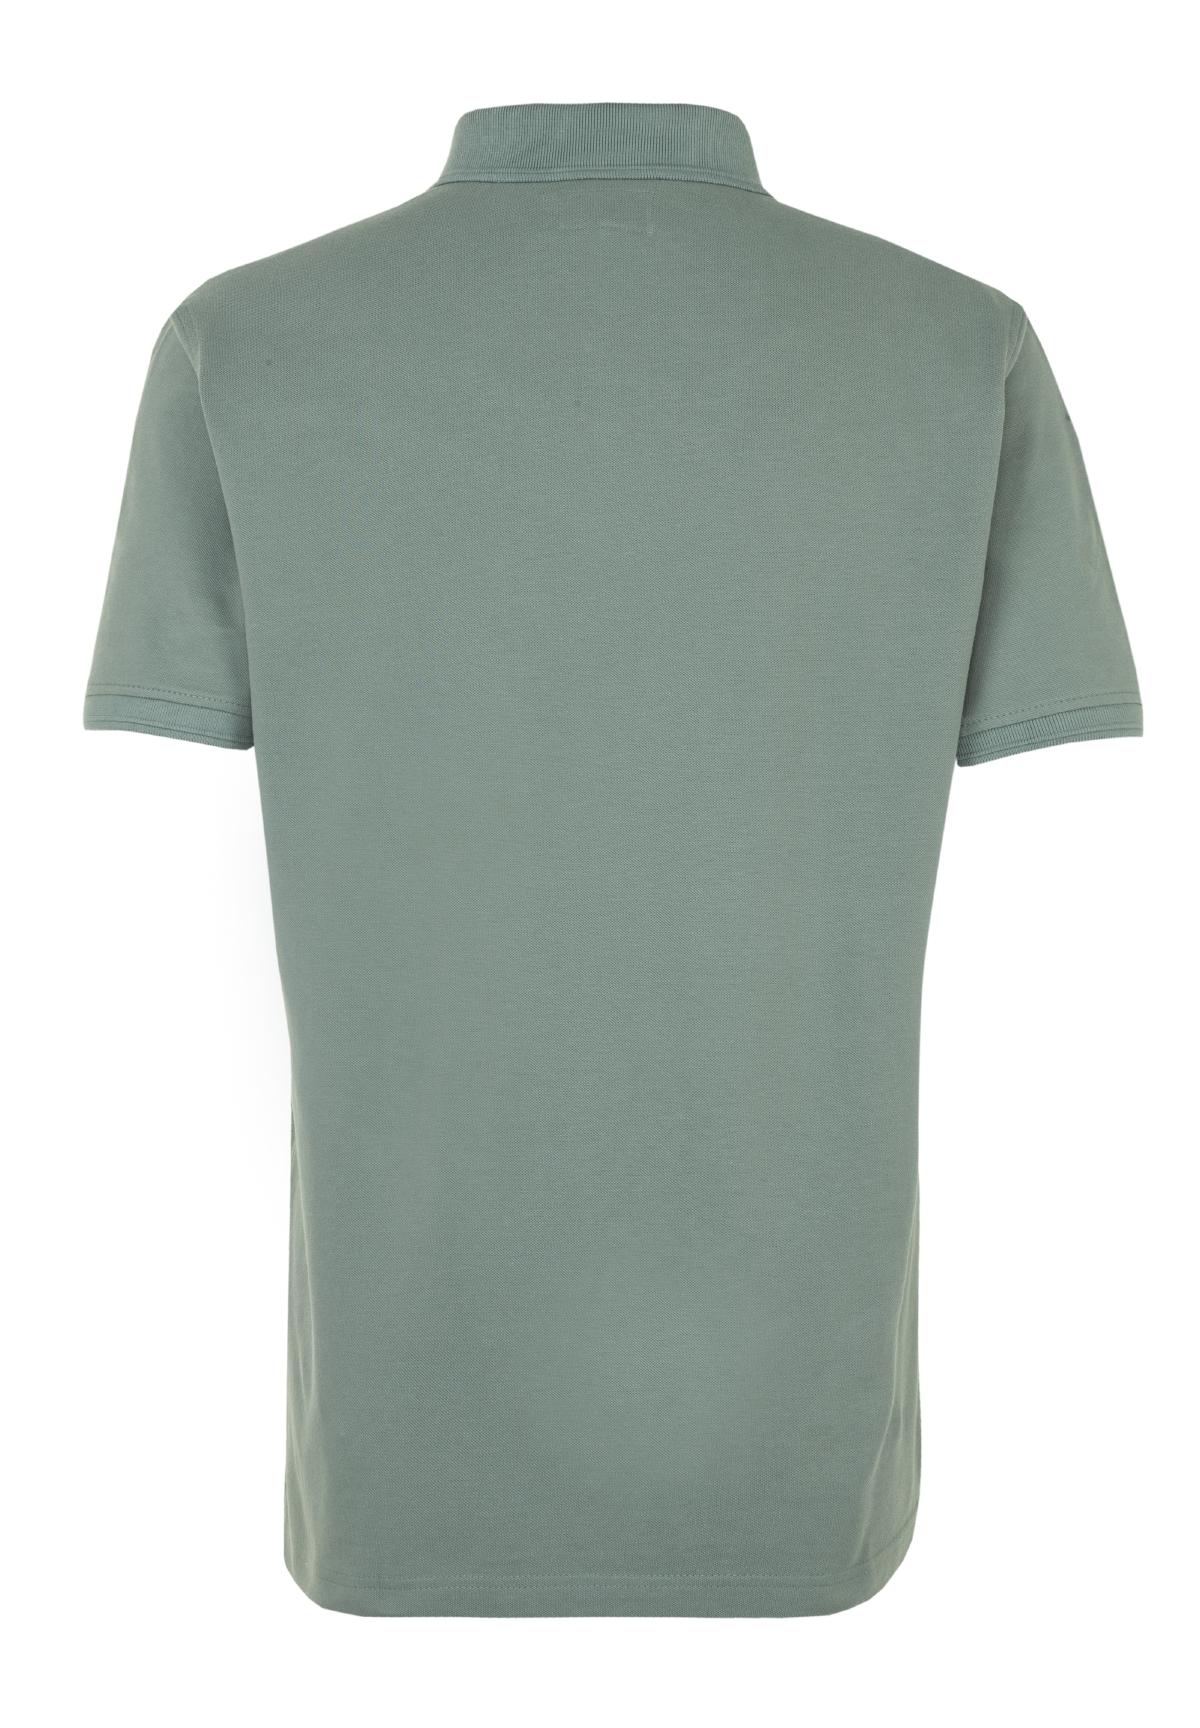 Camel-Active-Herren-Shirt-Poloshirt-Pique-Regular-Fit-NEU Indexbild 88